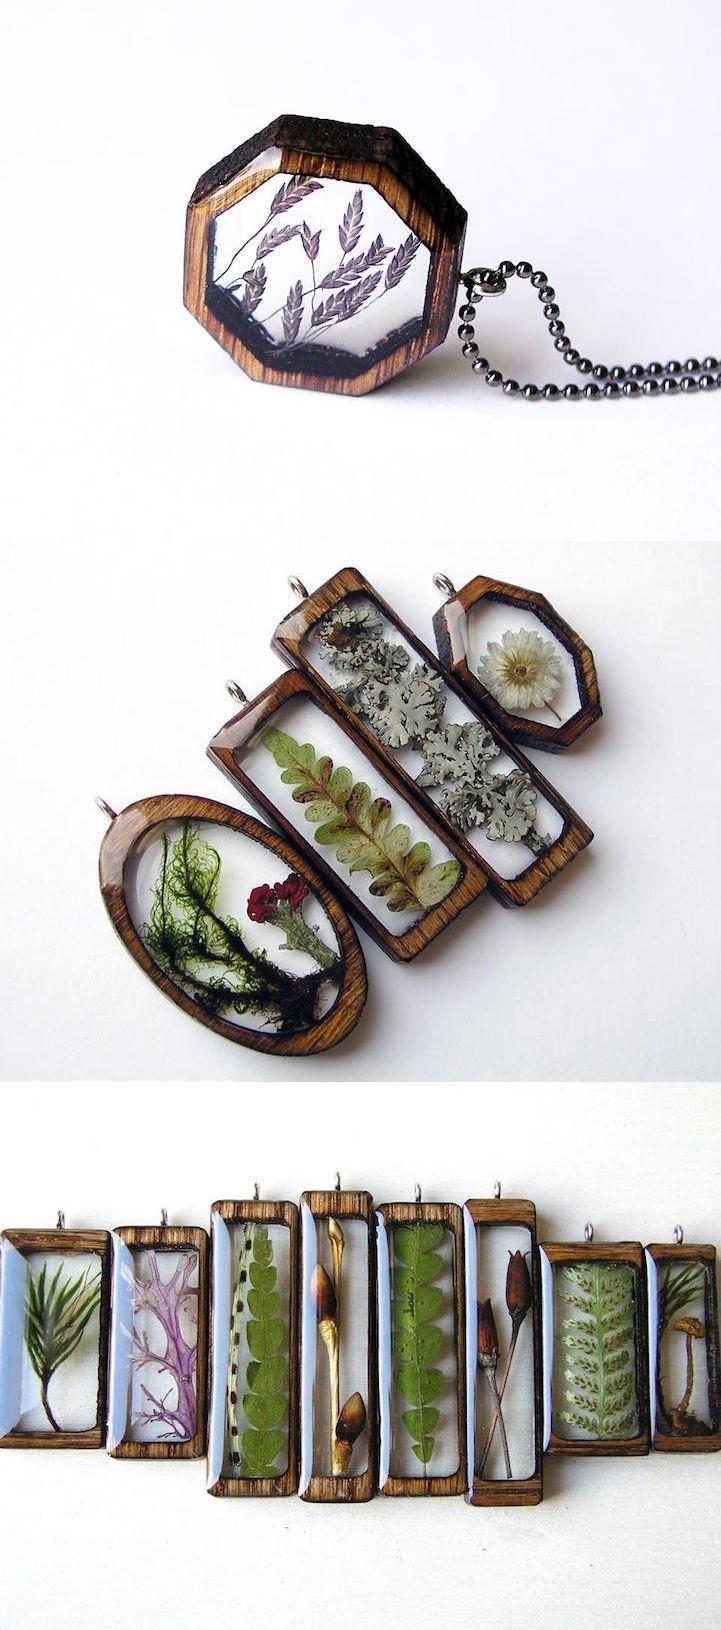 Artist Erin LaRocque (BuildWithWood) creates beautiful pendants